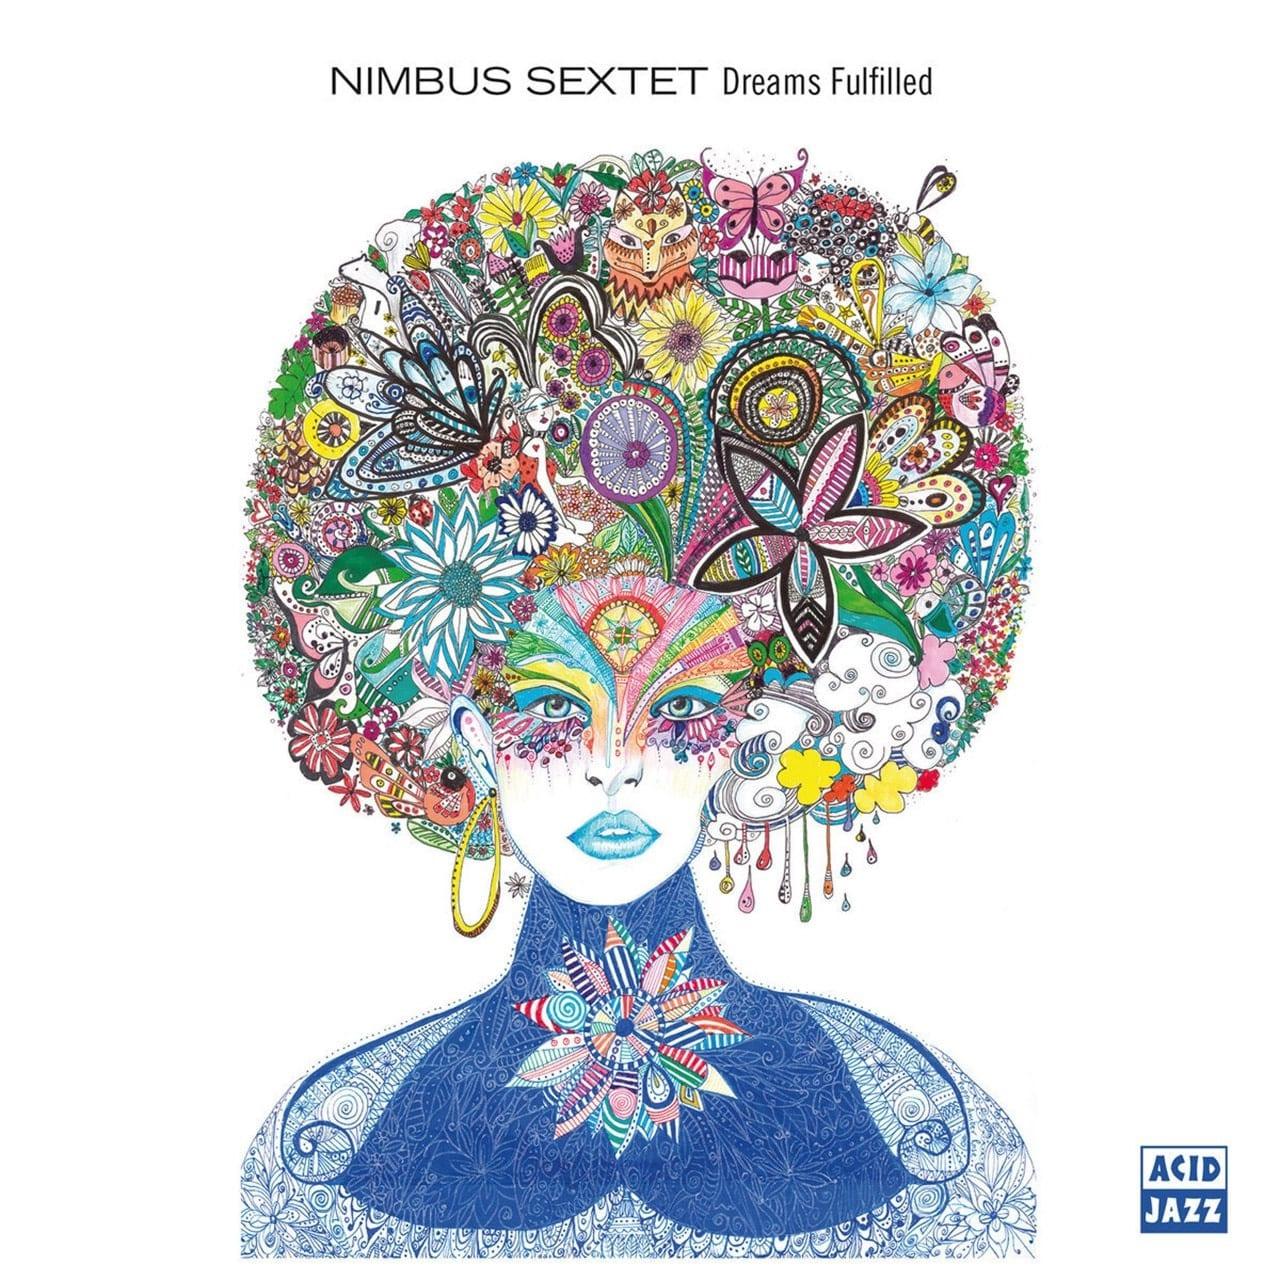 NIMBUS SEXTET - DREAMS FUFILLED